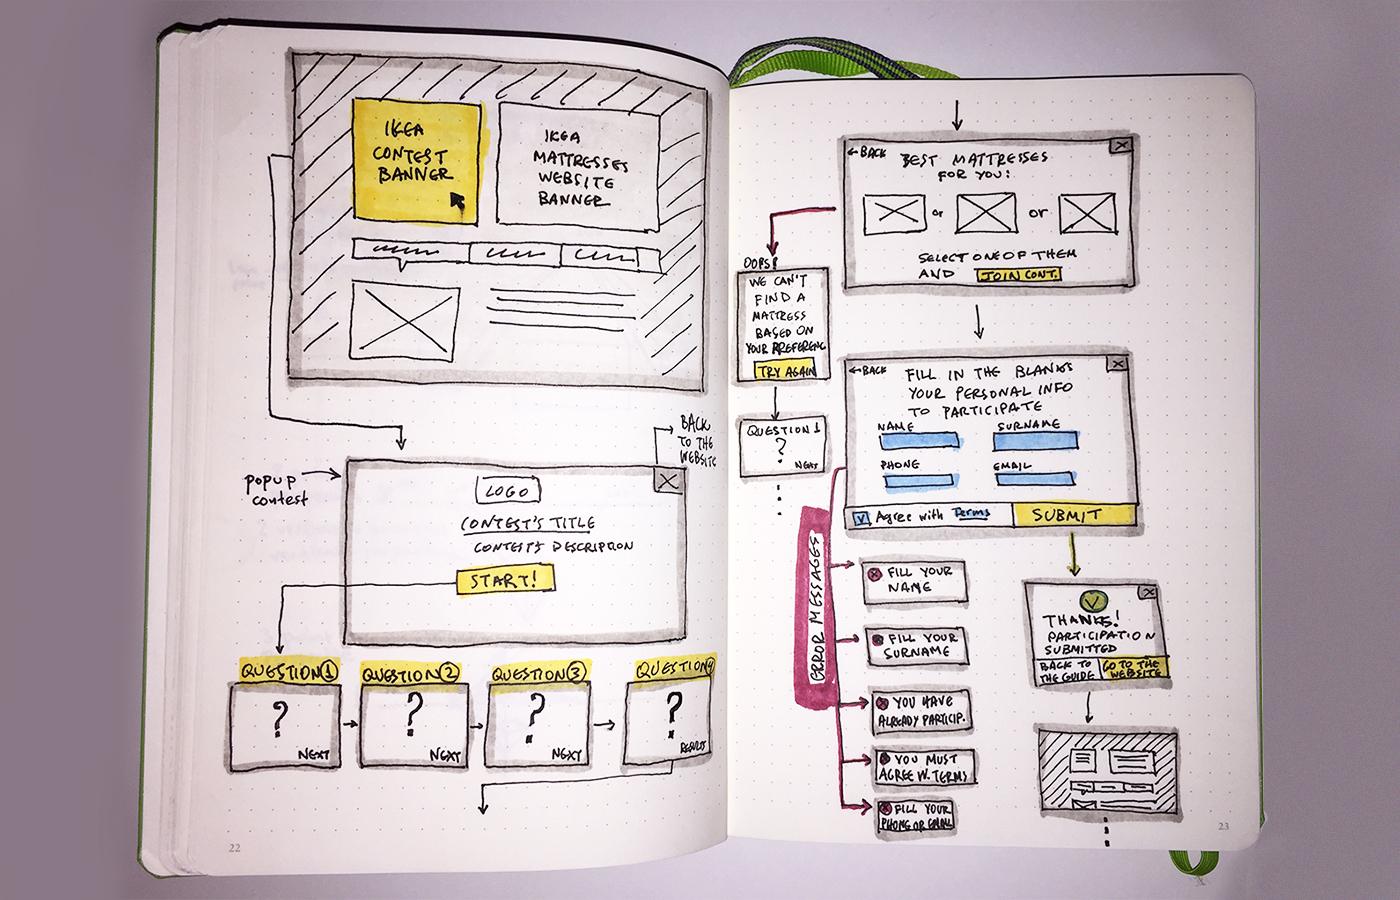 IKEA Mattresses Contest Flow Sketch